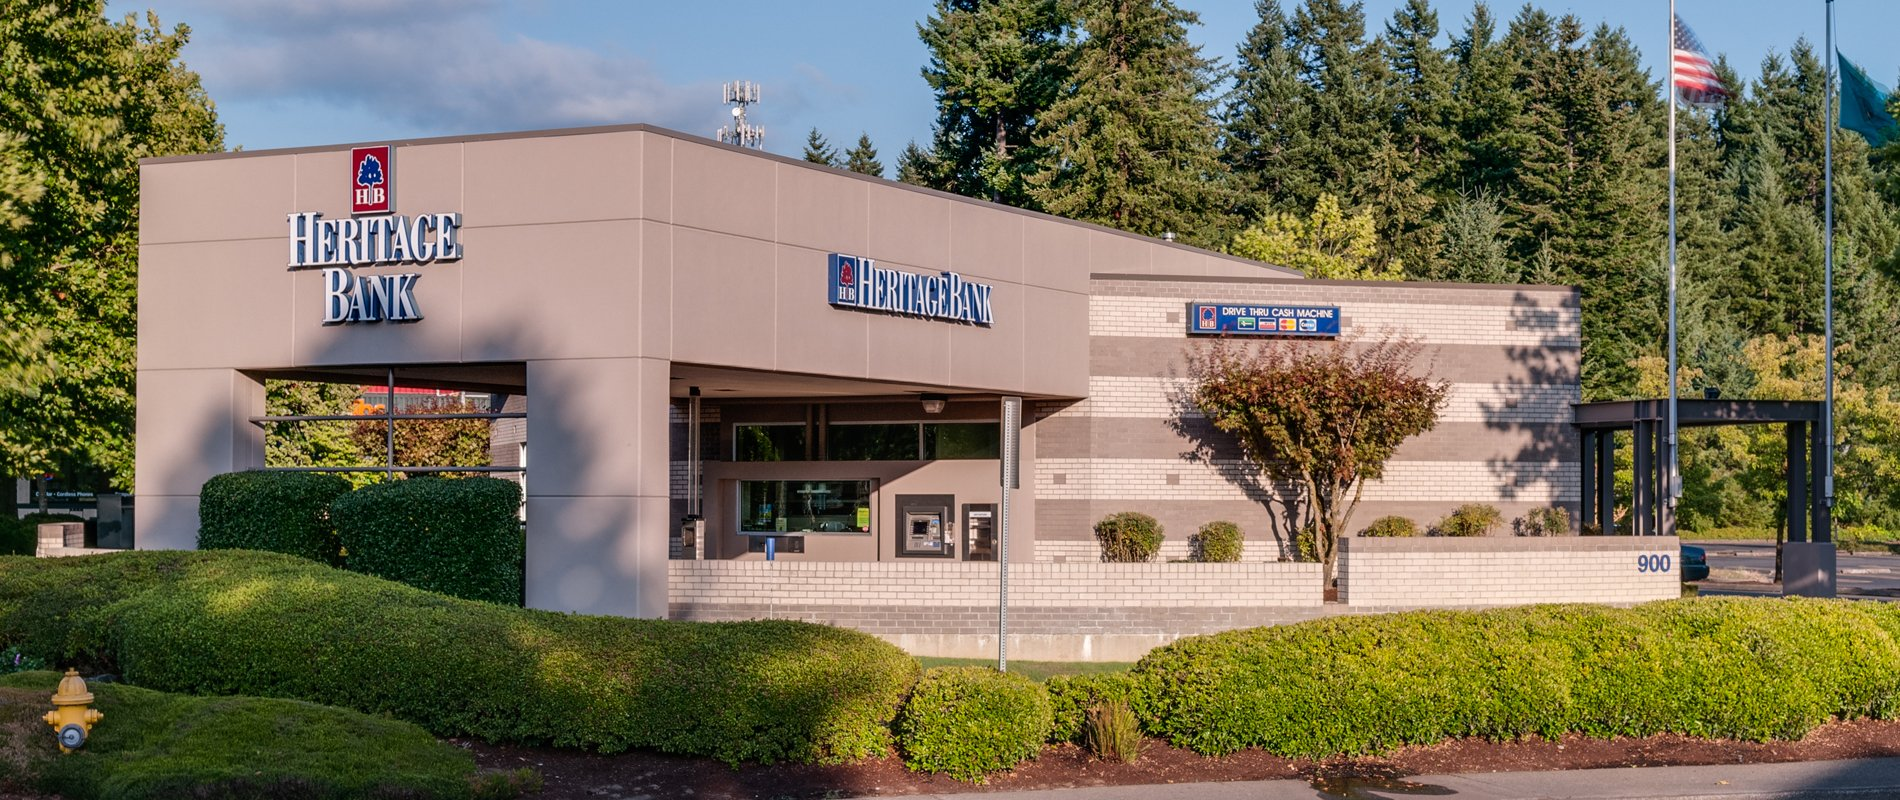 Washington Construction Company for Banks